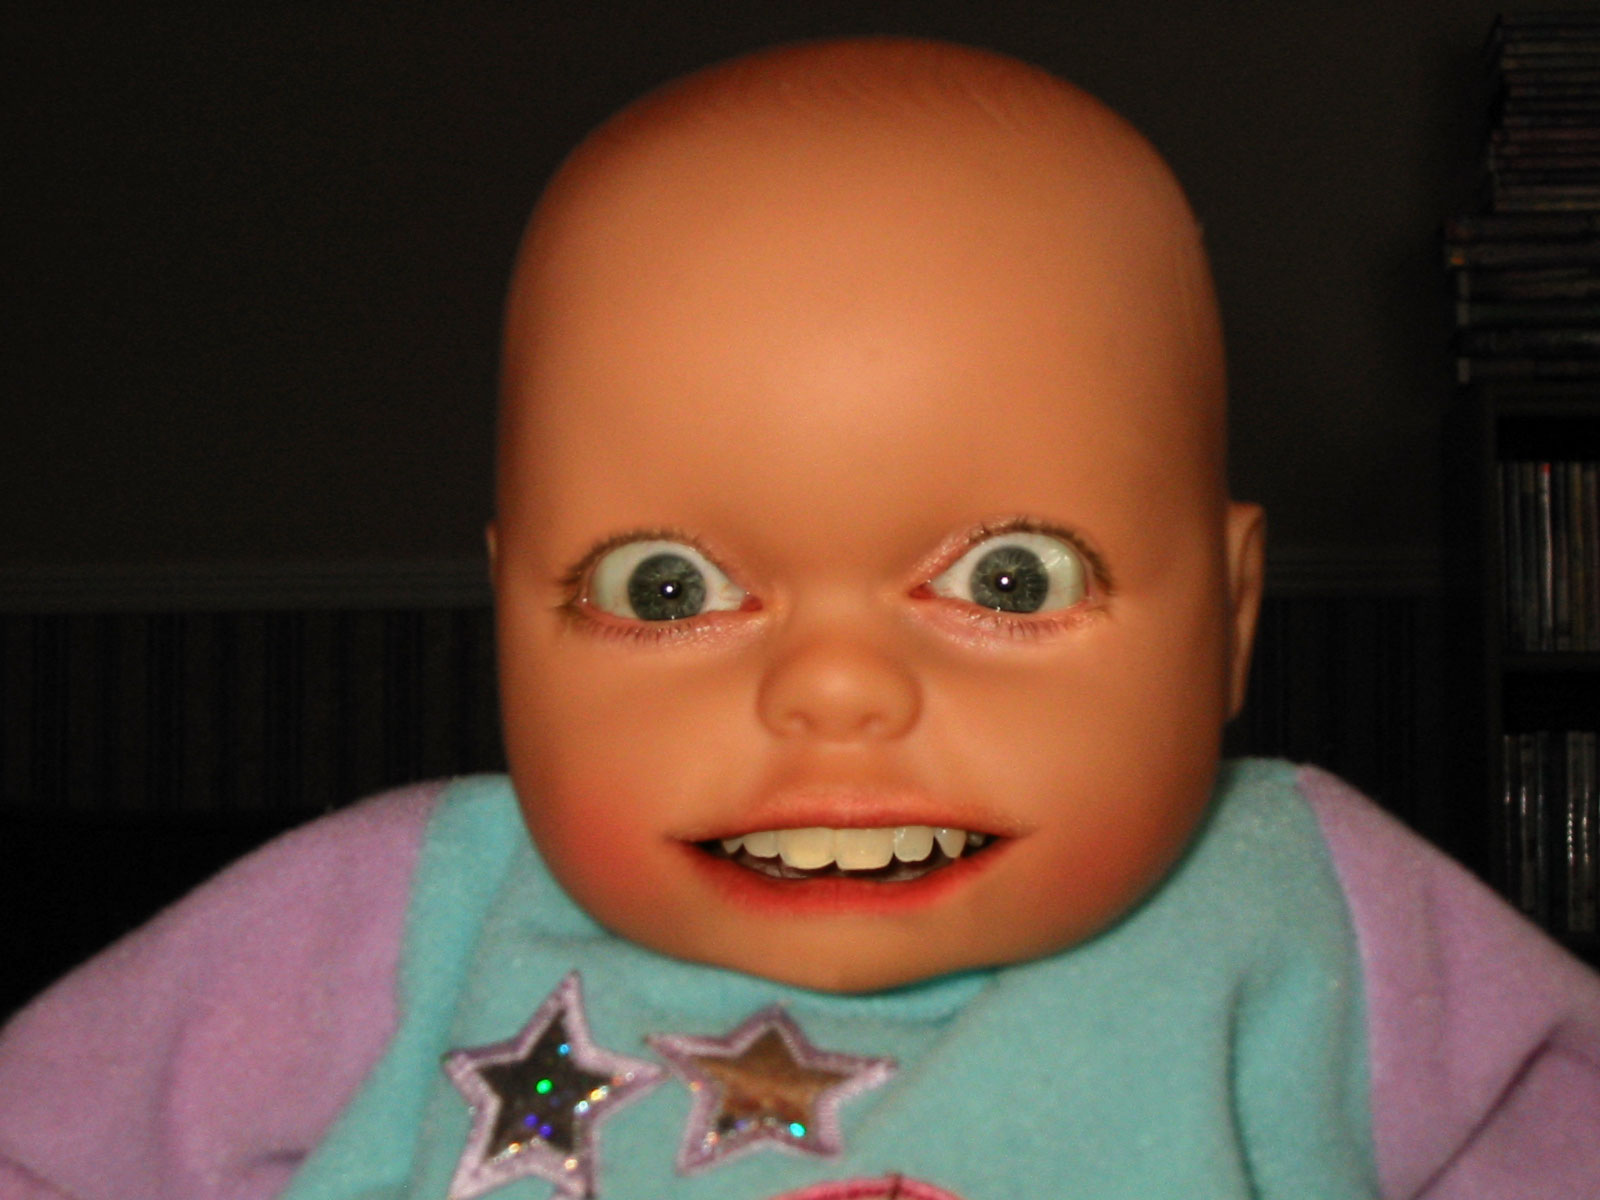 Funny Baby Meme Creator : Weird baby meme generator imgflip